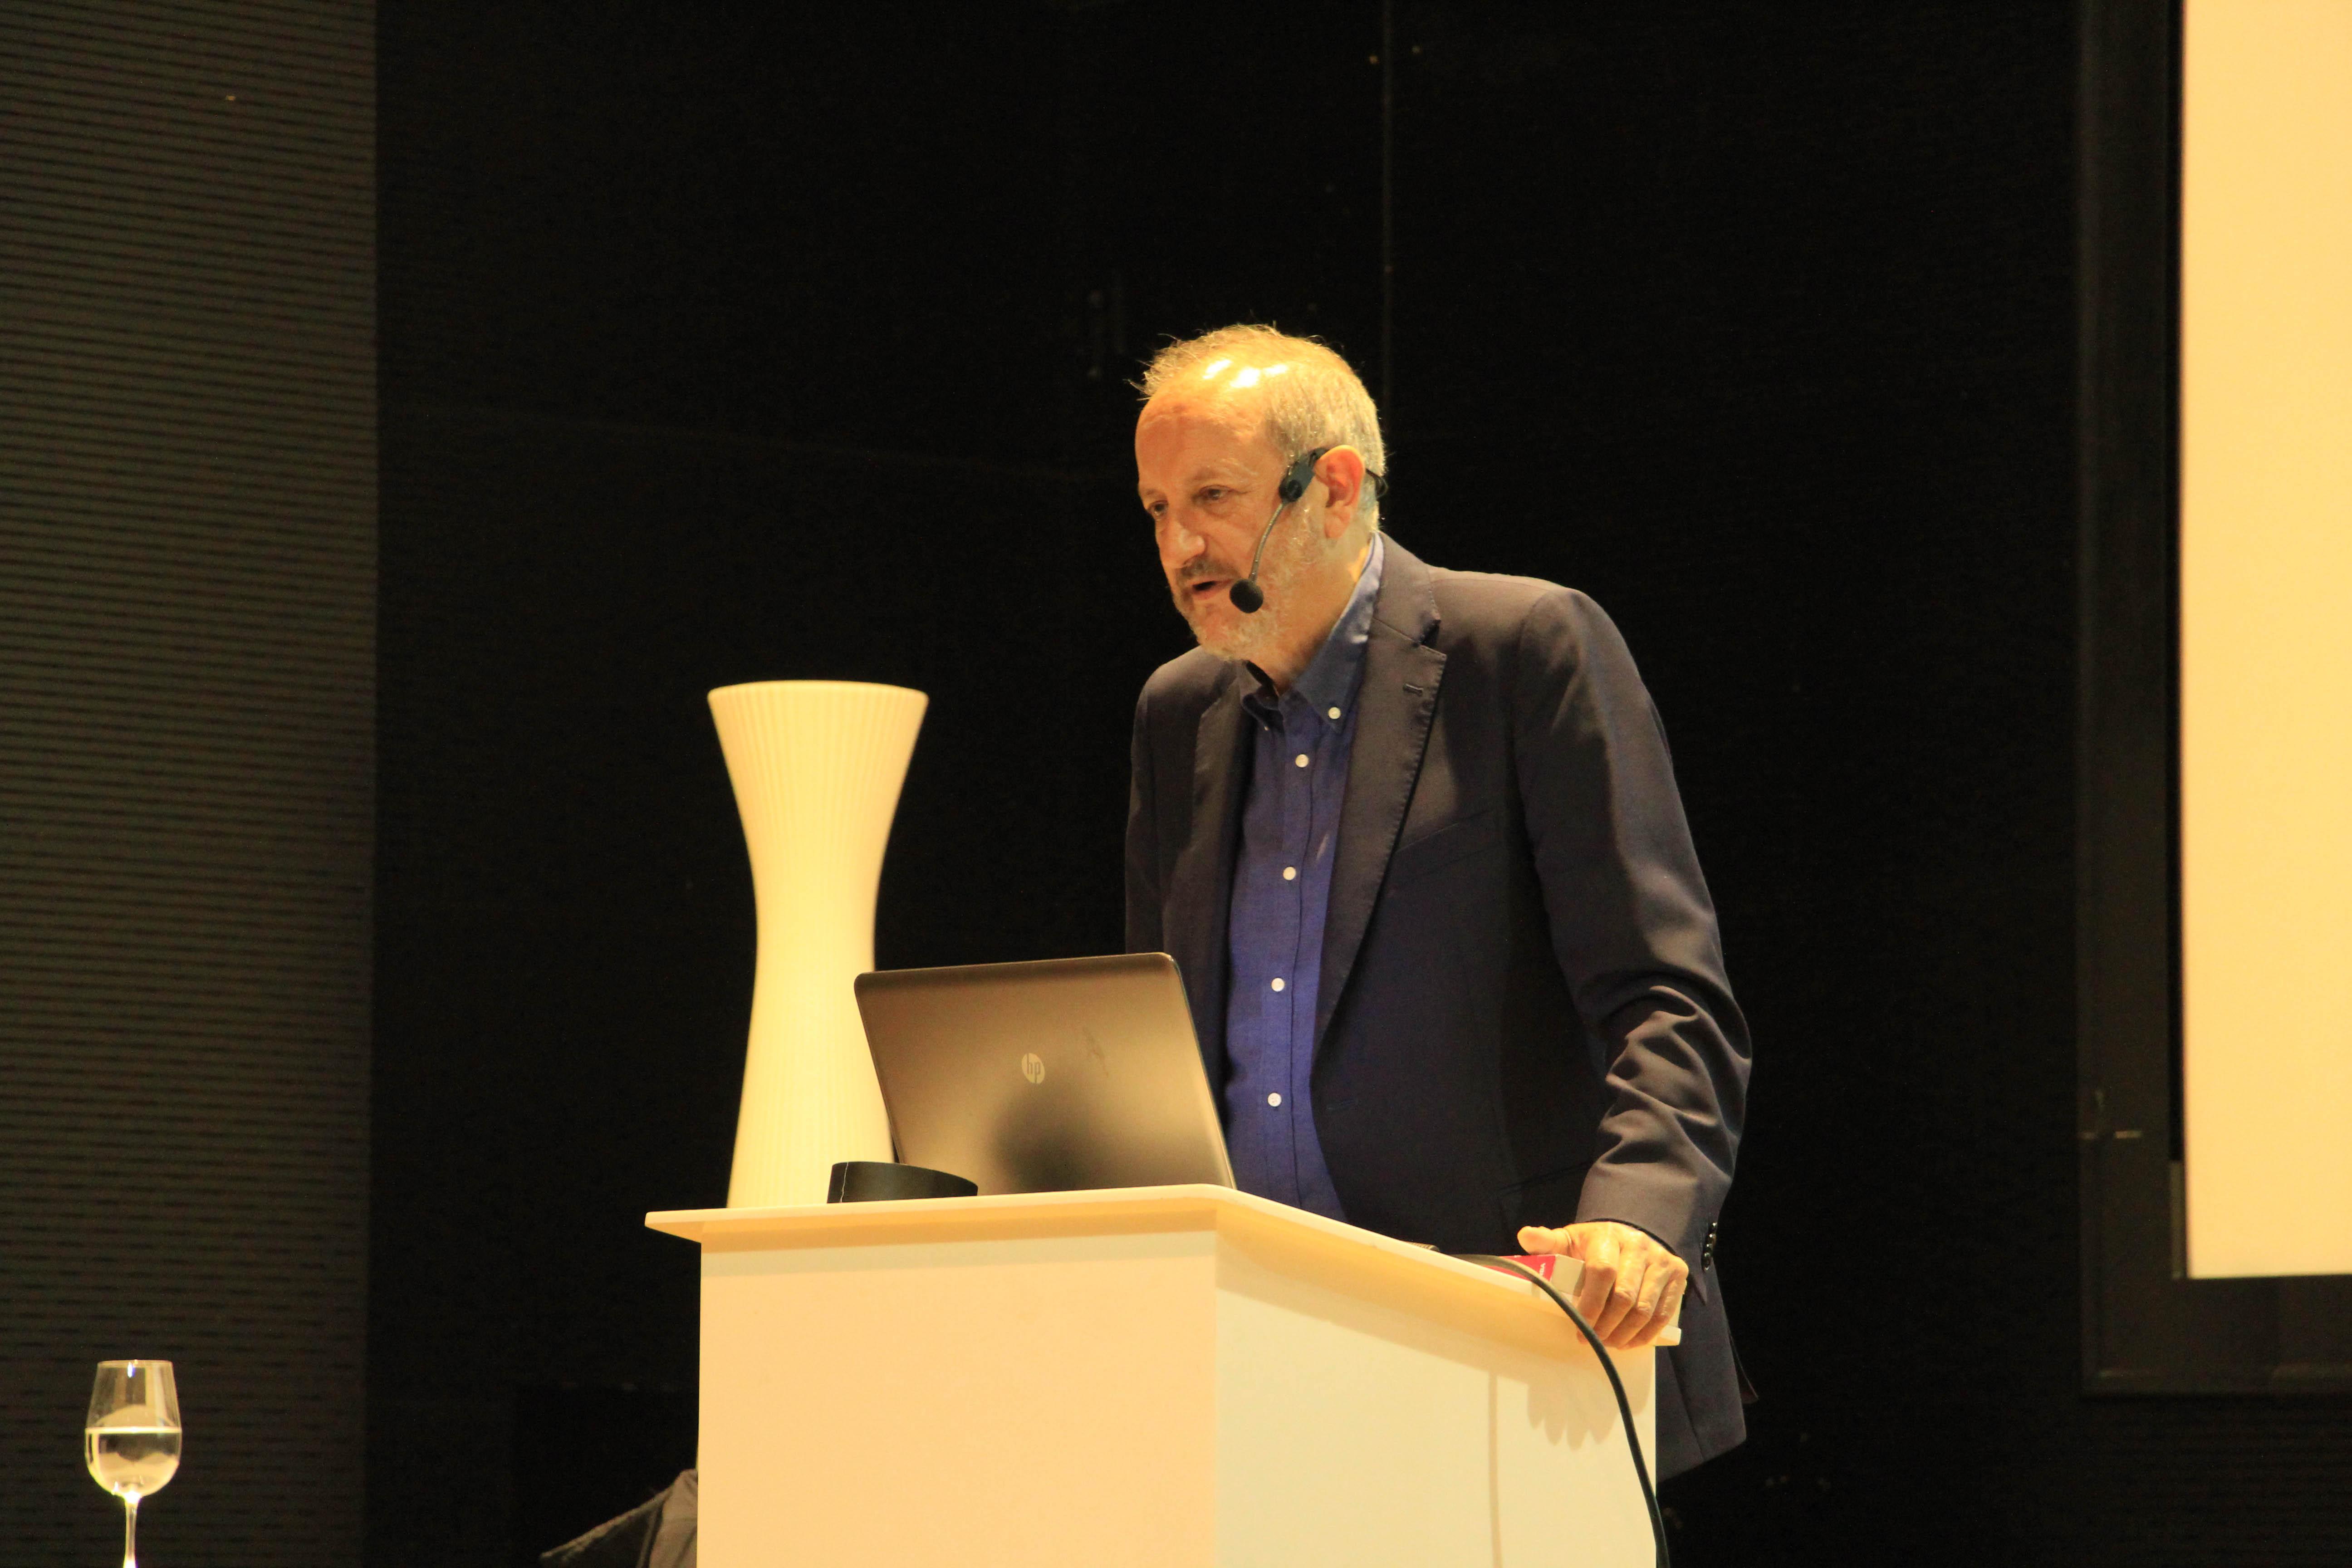 Nicolás Olea